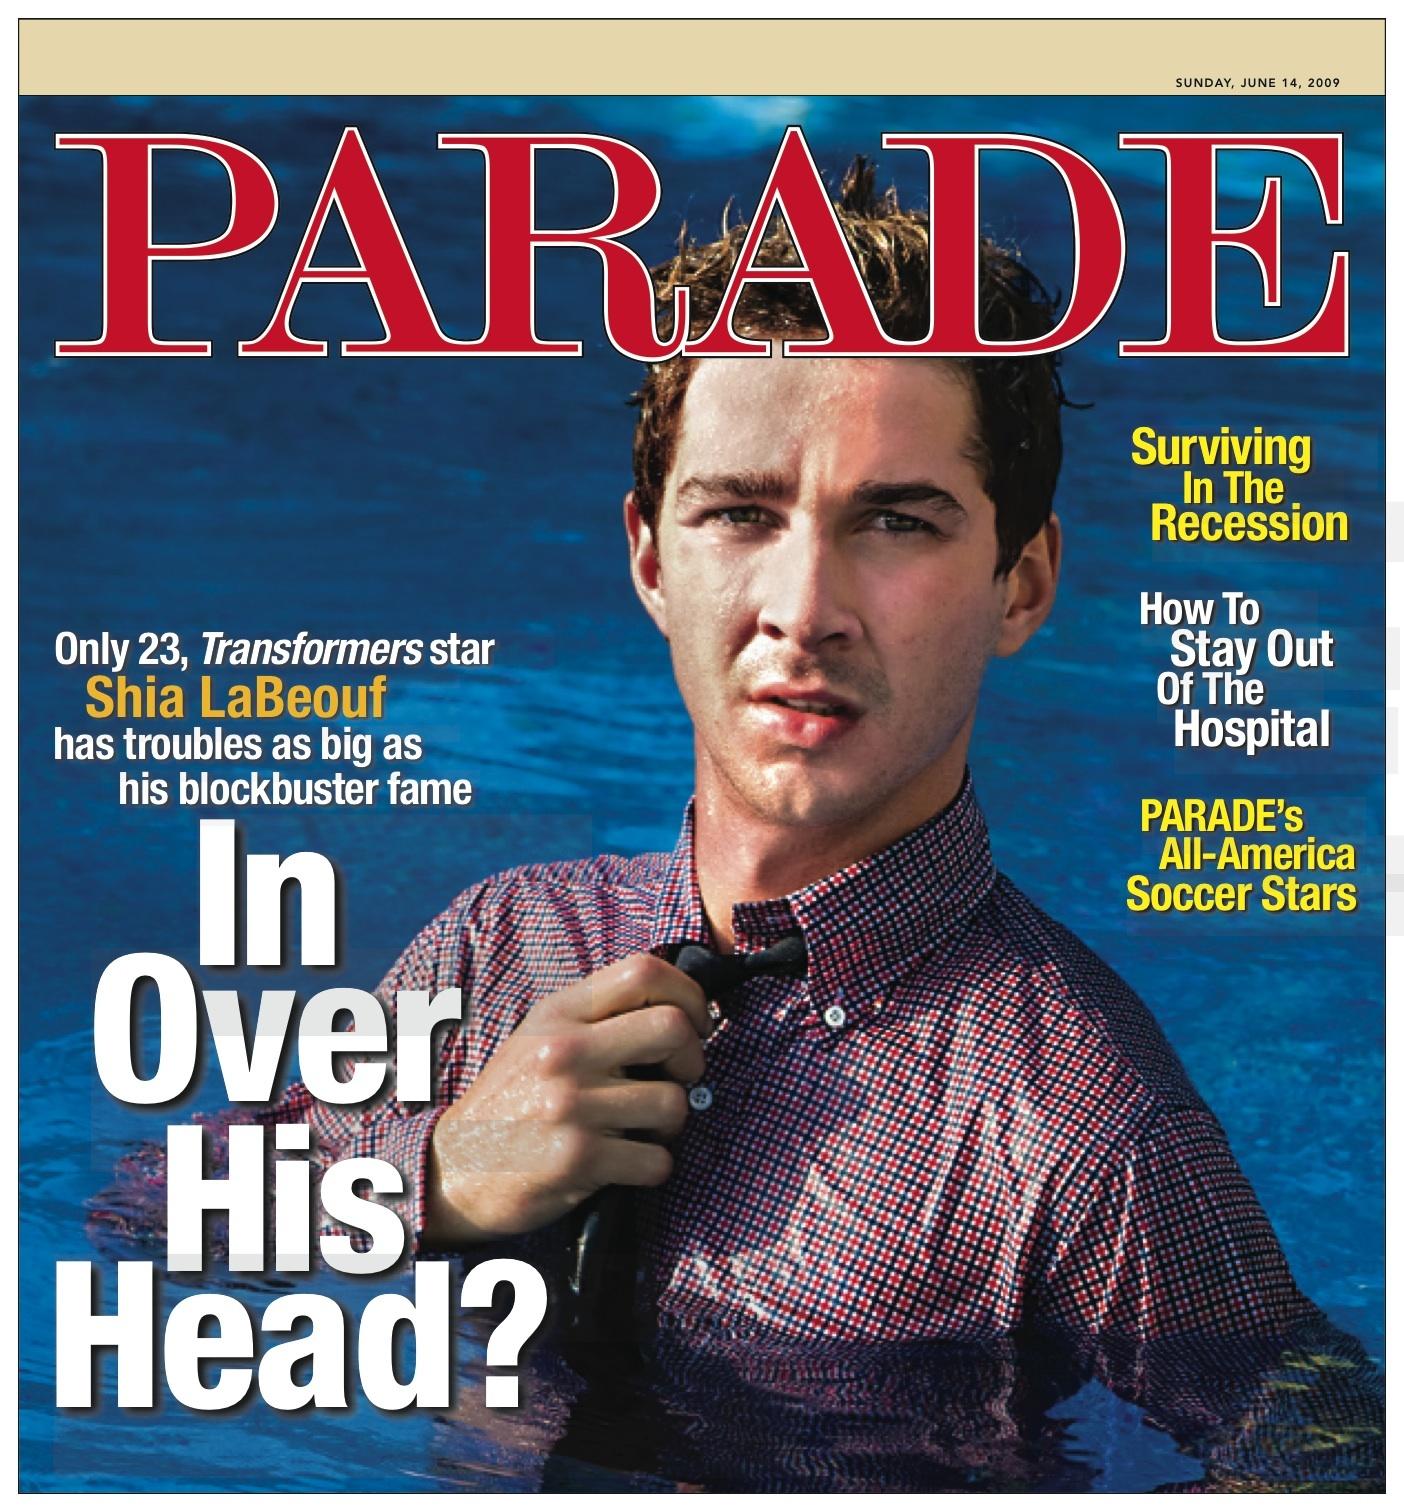 Shia LaBeouf, Parade Magazine June 14, 2009